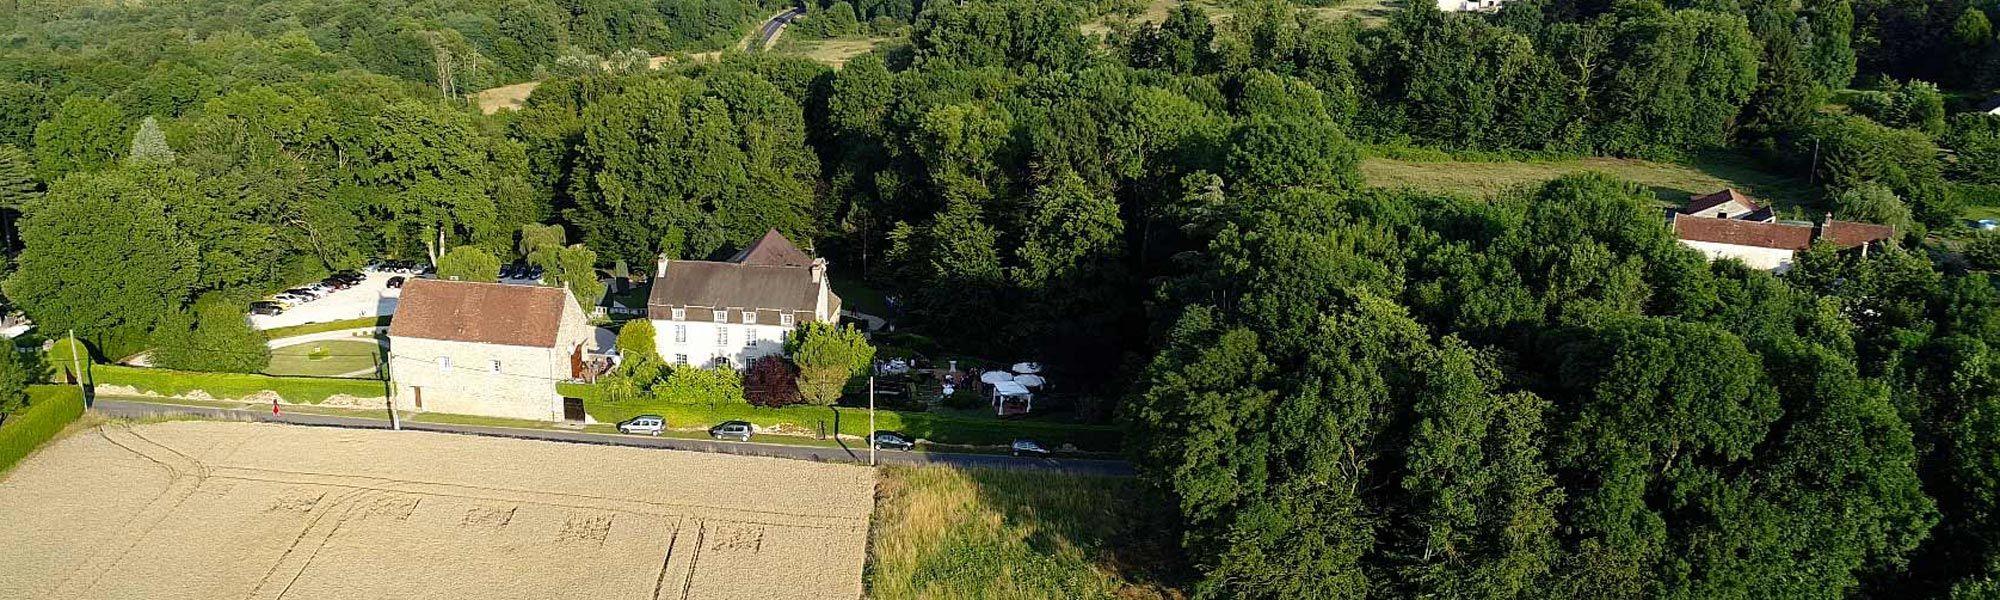 Location salle de mariage en Ile de France